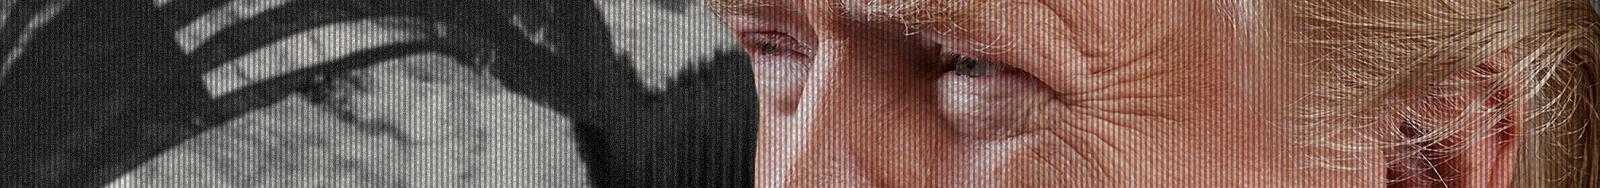 La América de Trump